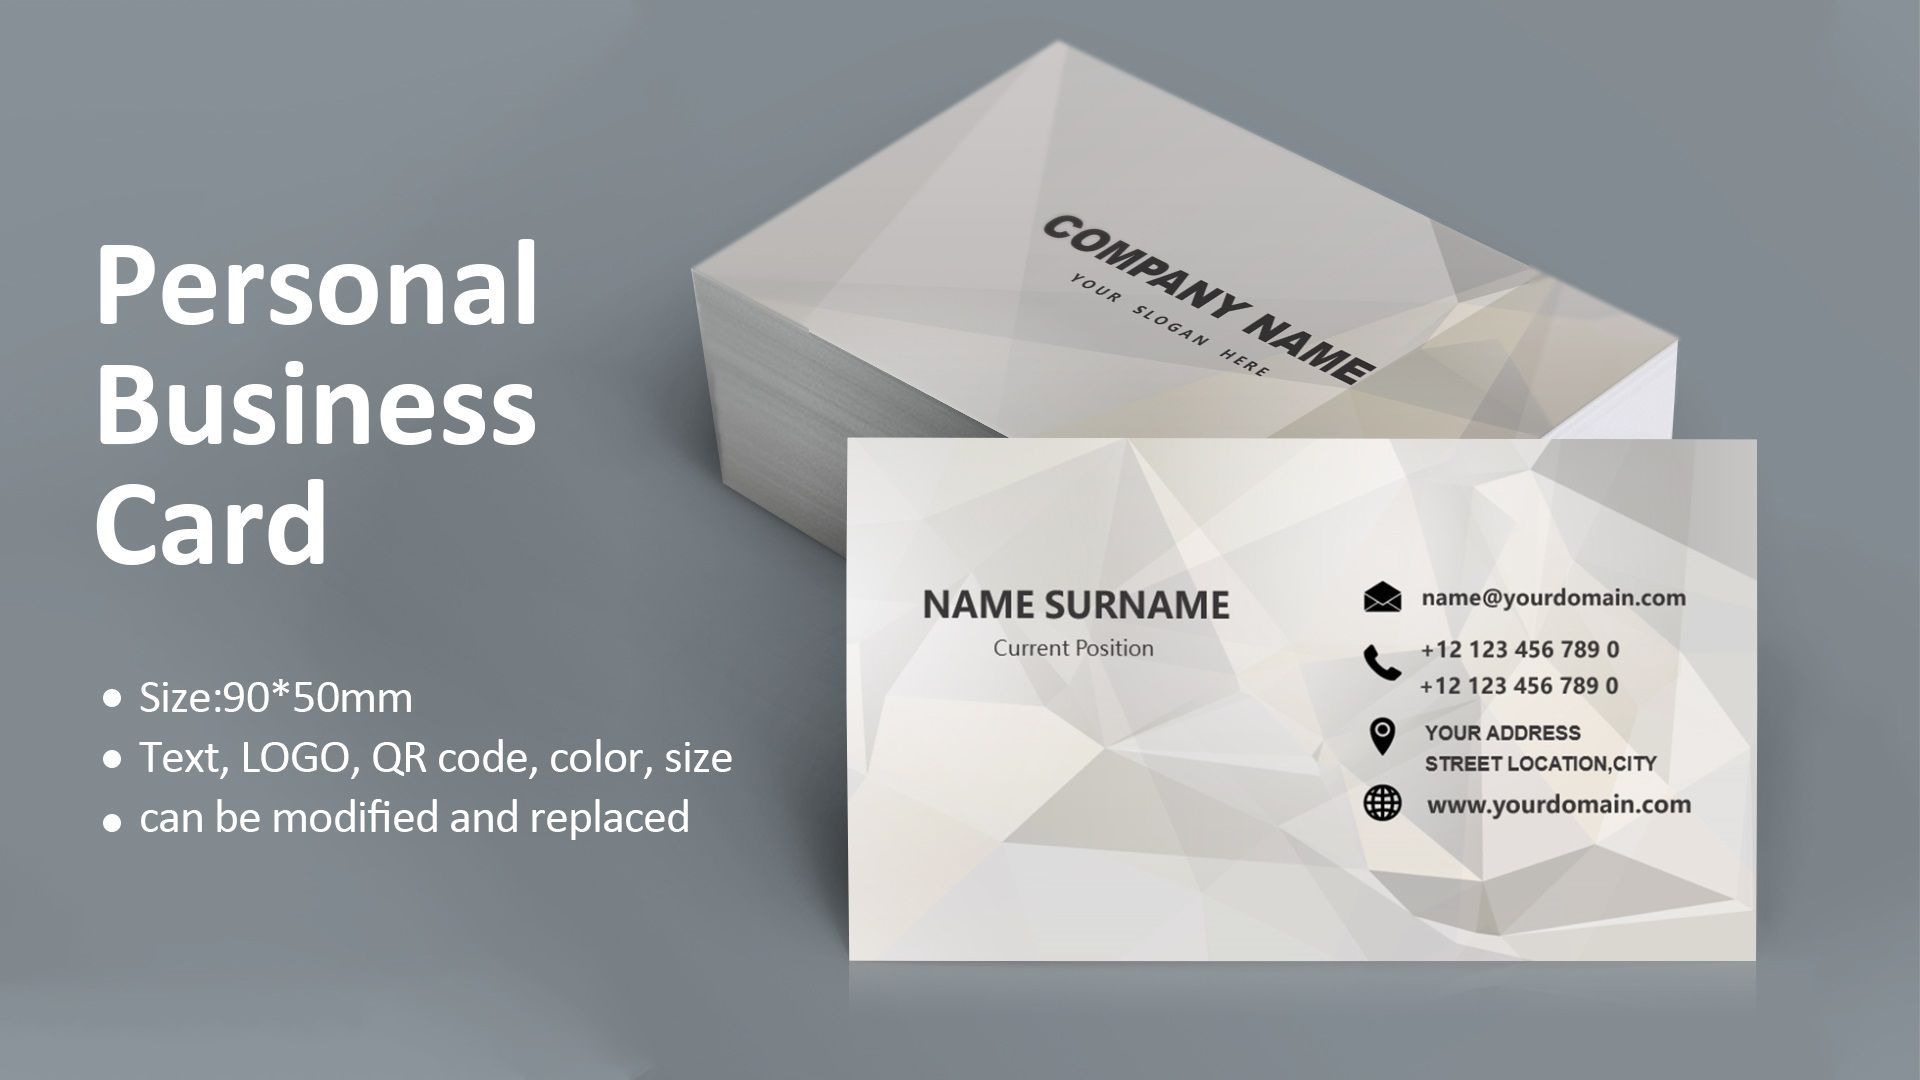 000 Astounding Simple Busines Card Template Free Download Sample  Visiting Design Psd File MinimalistFull